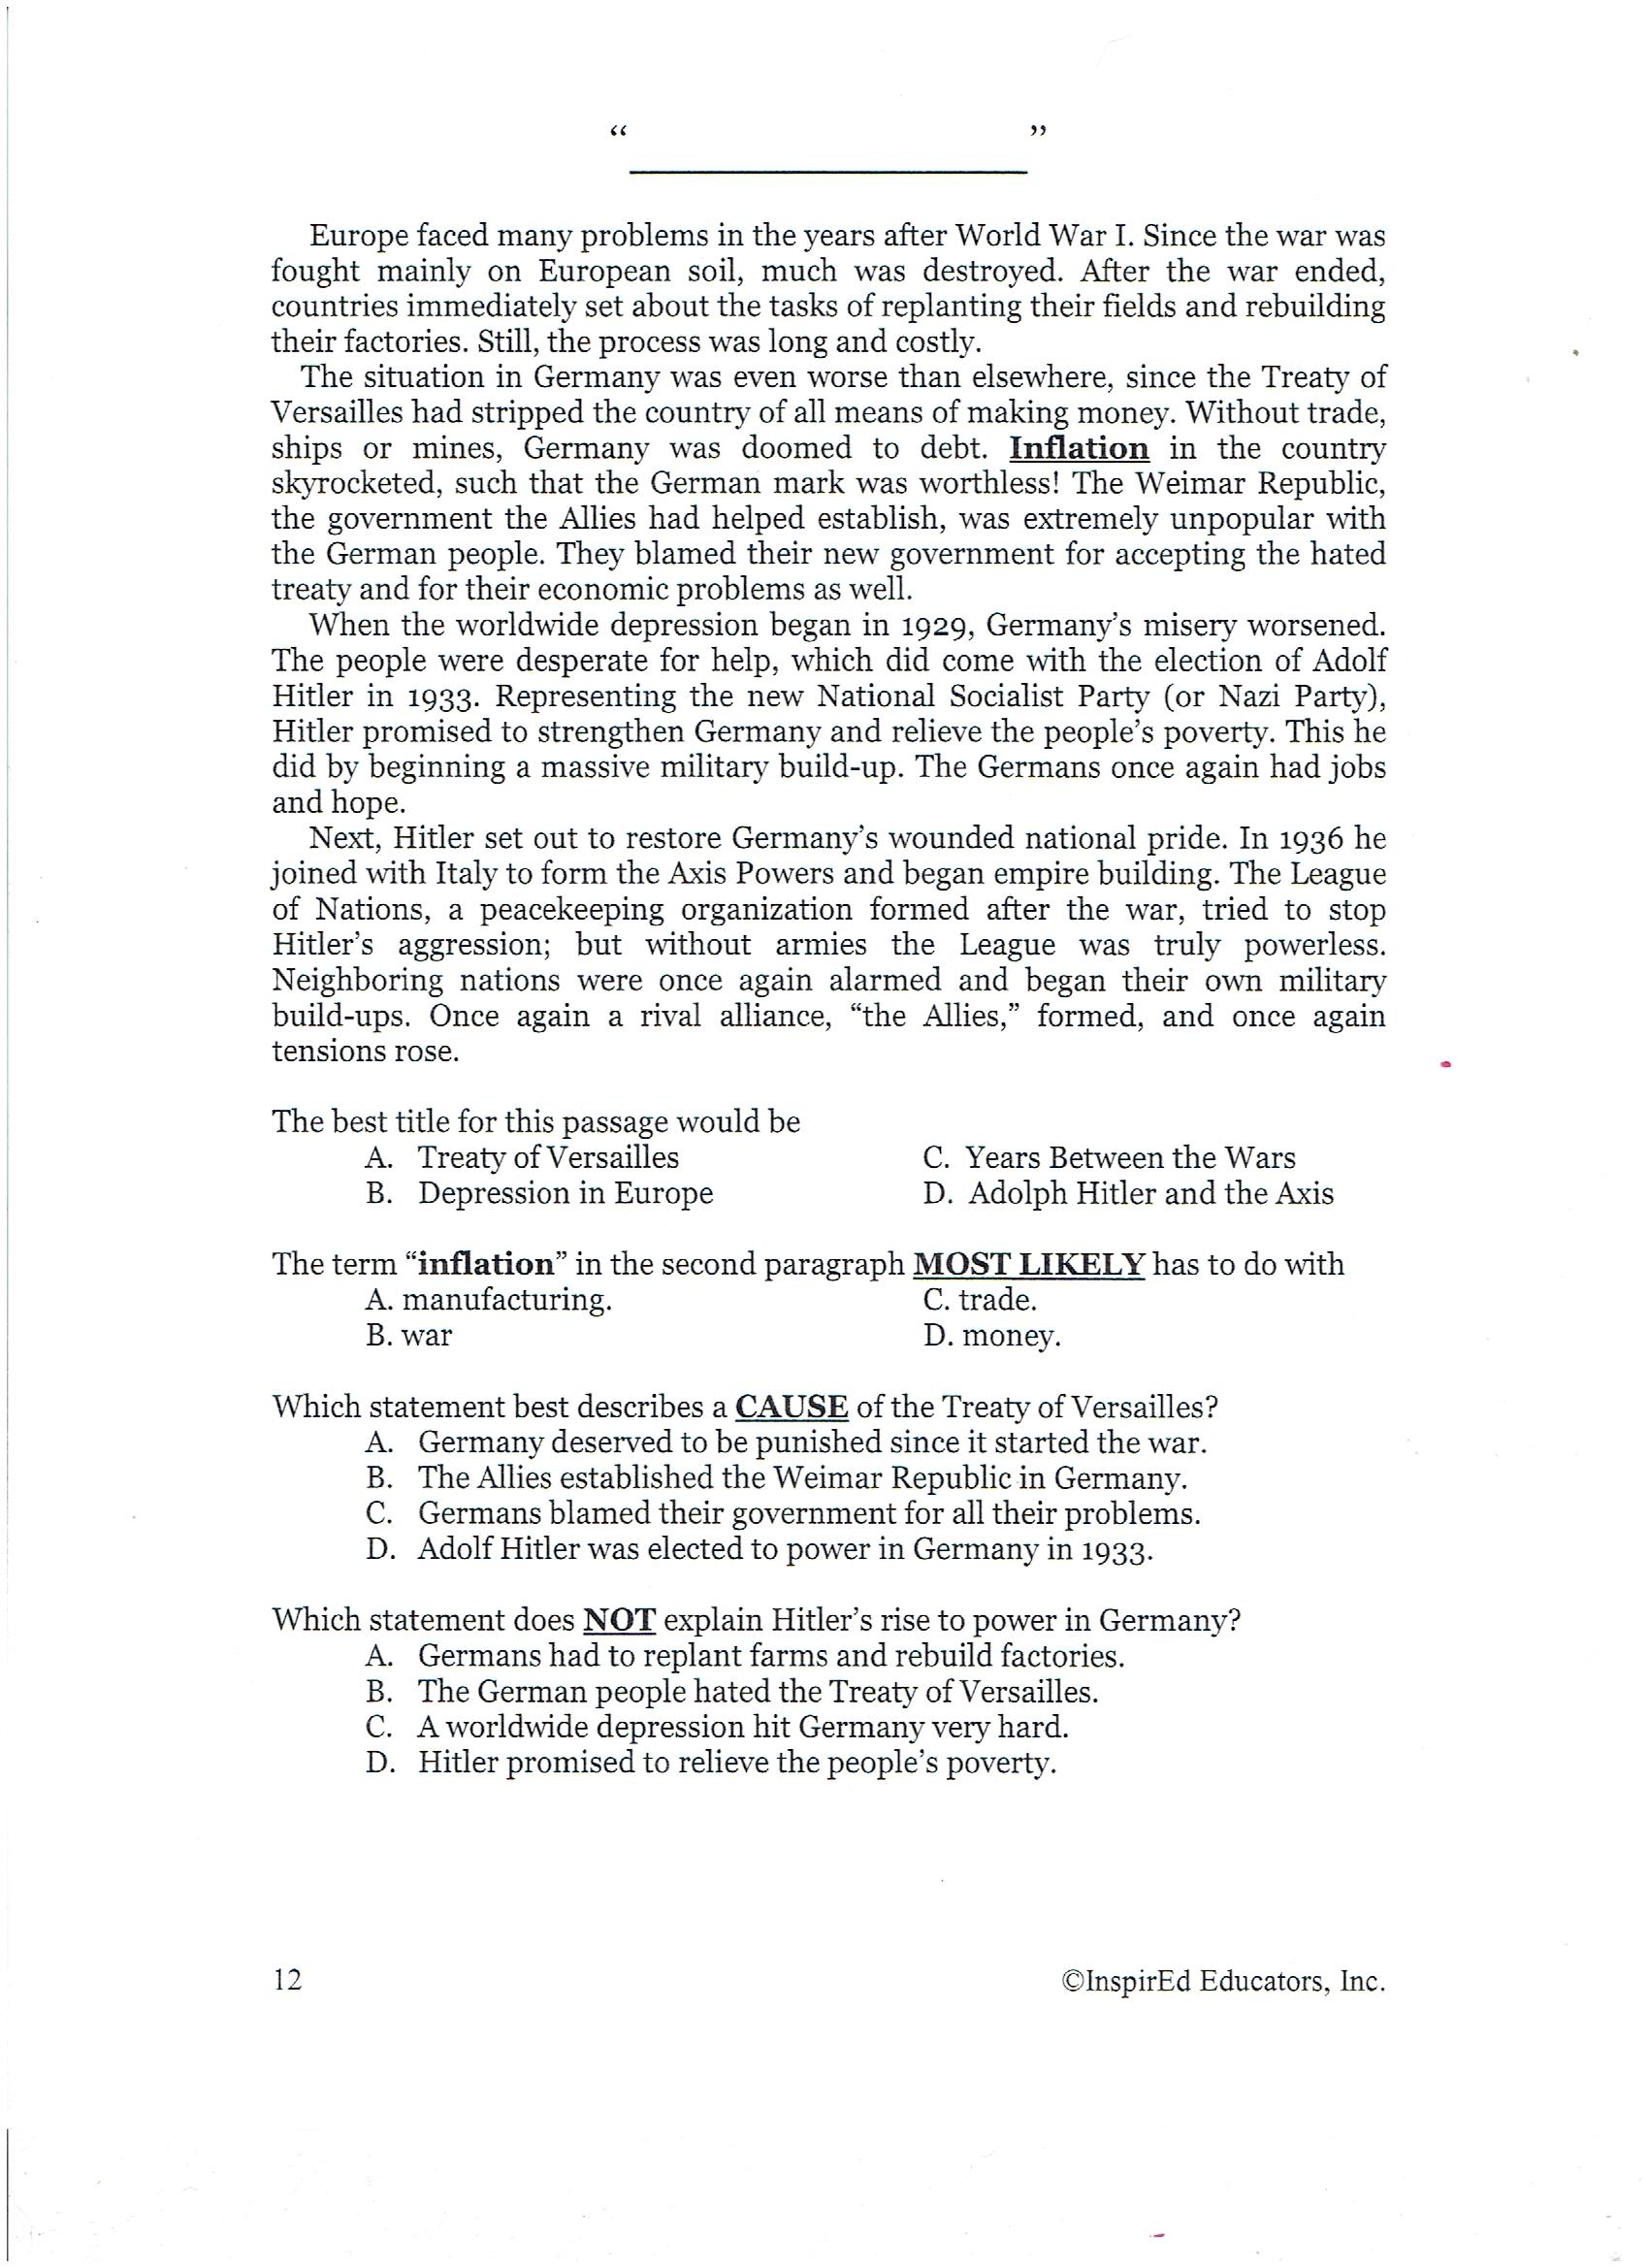 Worksheet Treaty Of Versailles Worksheet Grass Fedjp